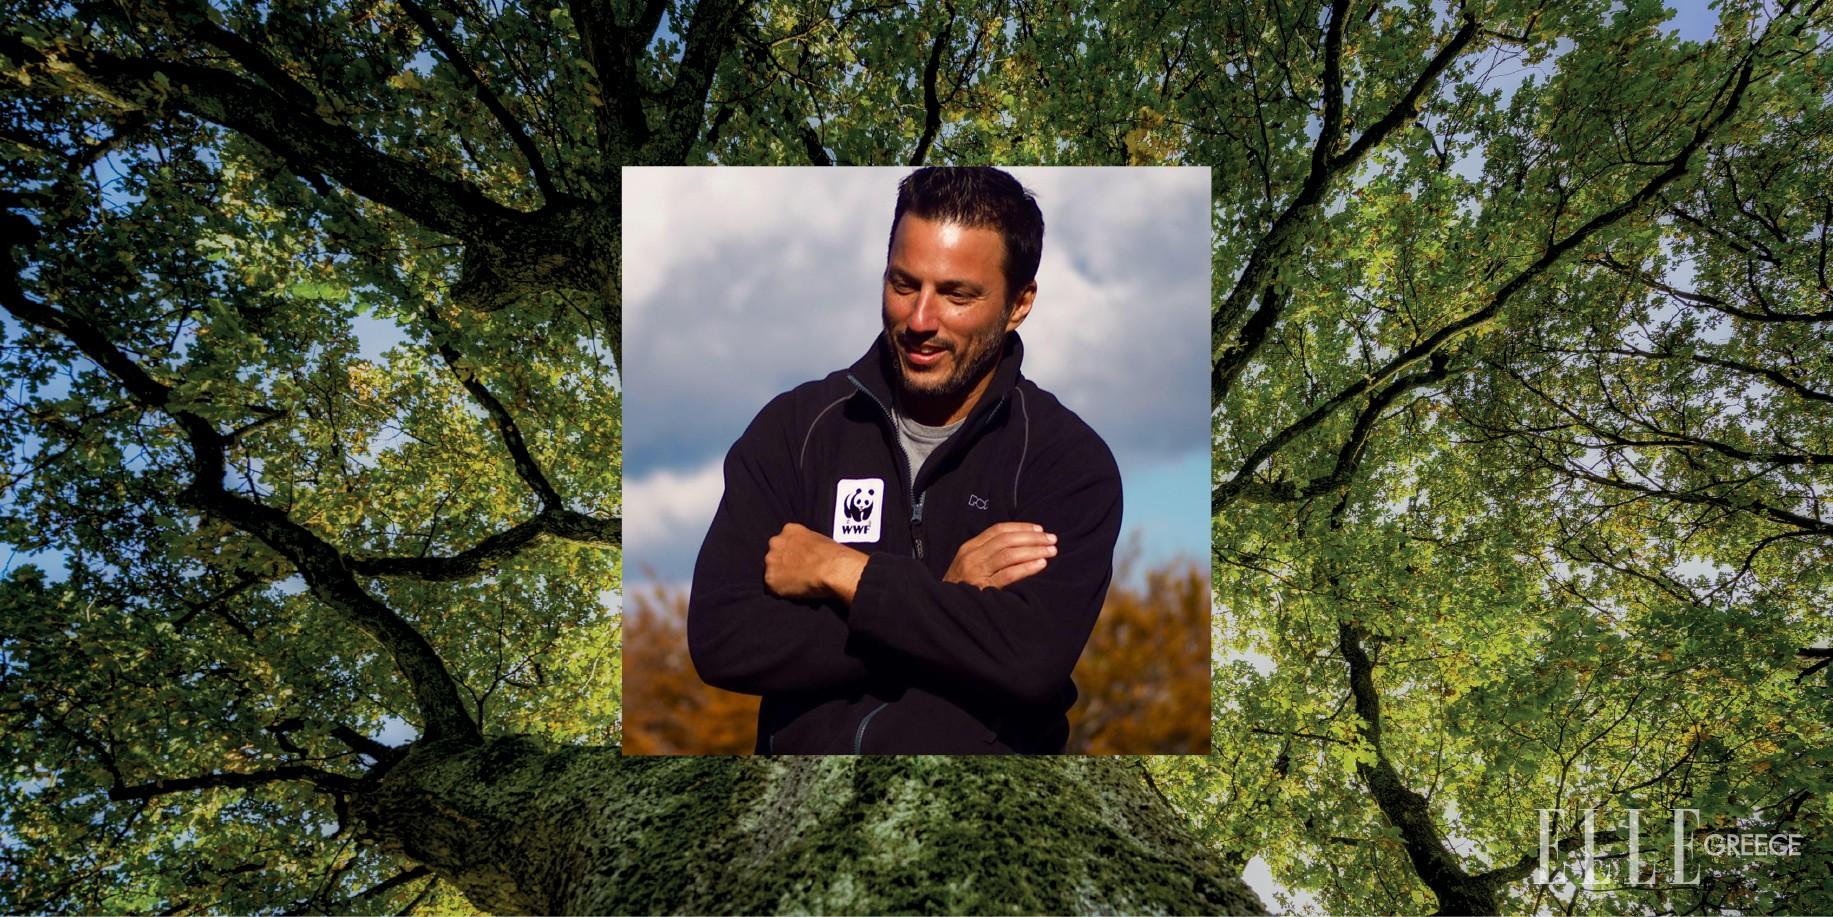 «O Covid-19 είναι η απόδειξη της κακής σχέσης μας με τη φύση»: Ο Δημήτρης Καραβέλλας, Γενικός Διευθυντής της WWF Ελλάς μιλά στο ELLE Ο Δηµήτρης Καραβέλλας, Γενικός Διευθυντής της WWF Ελλάς, υποστηρίζει ότι η πανδημία αποδεικνύει με τον πιο σκληρό τρόπο ότι η σχέση του ανθρώπου με το περιβάλλον δεν είναι αυτή που θα έπρεπε.